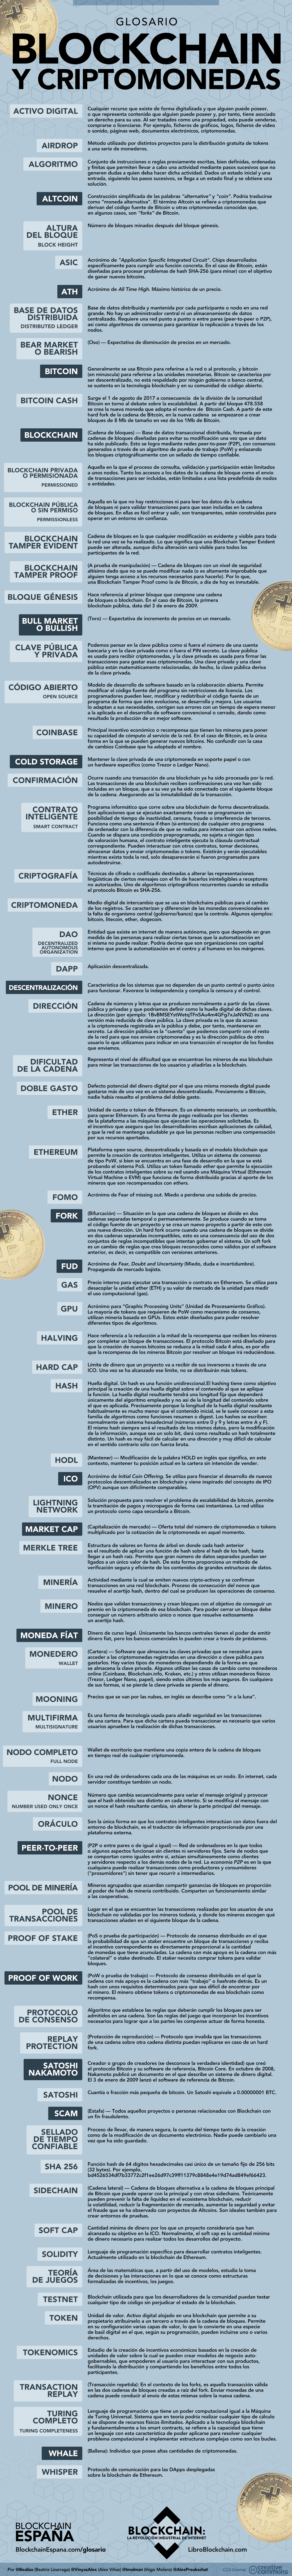 terminologia bitcoin